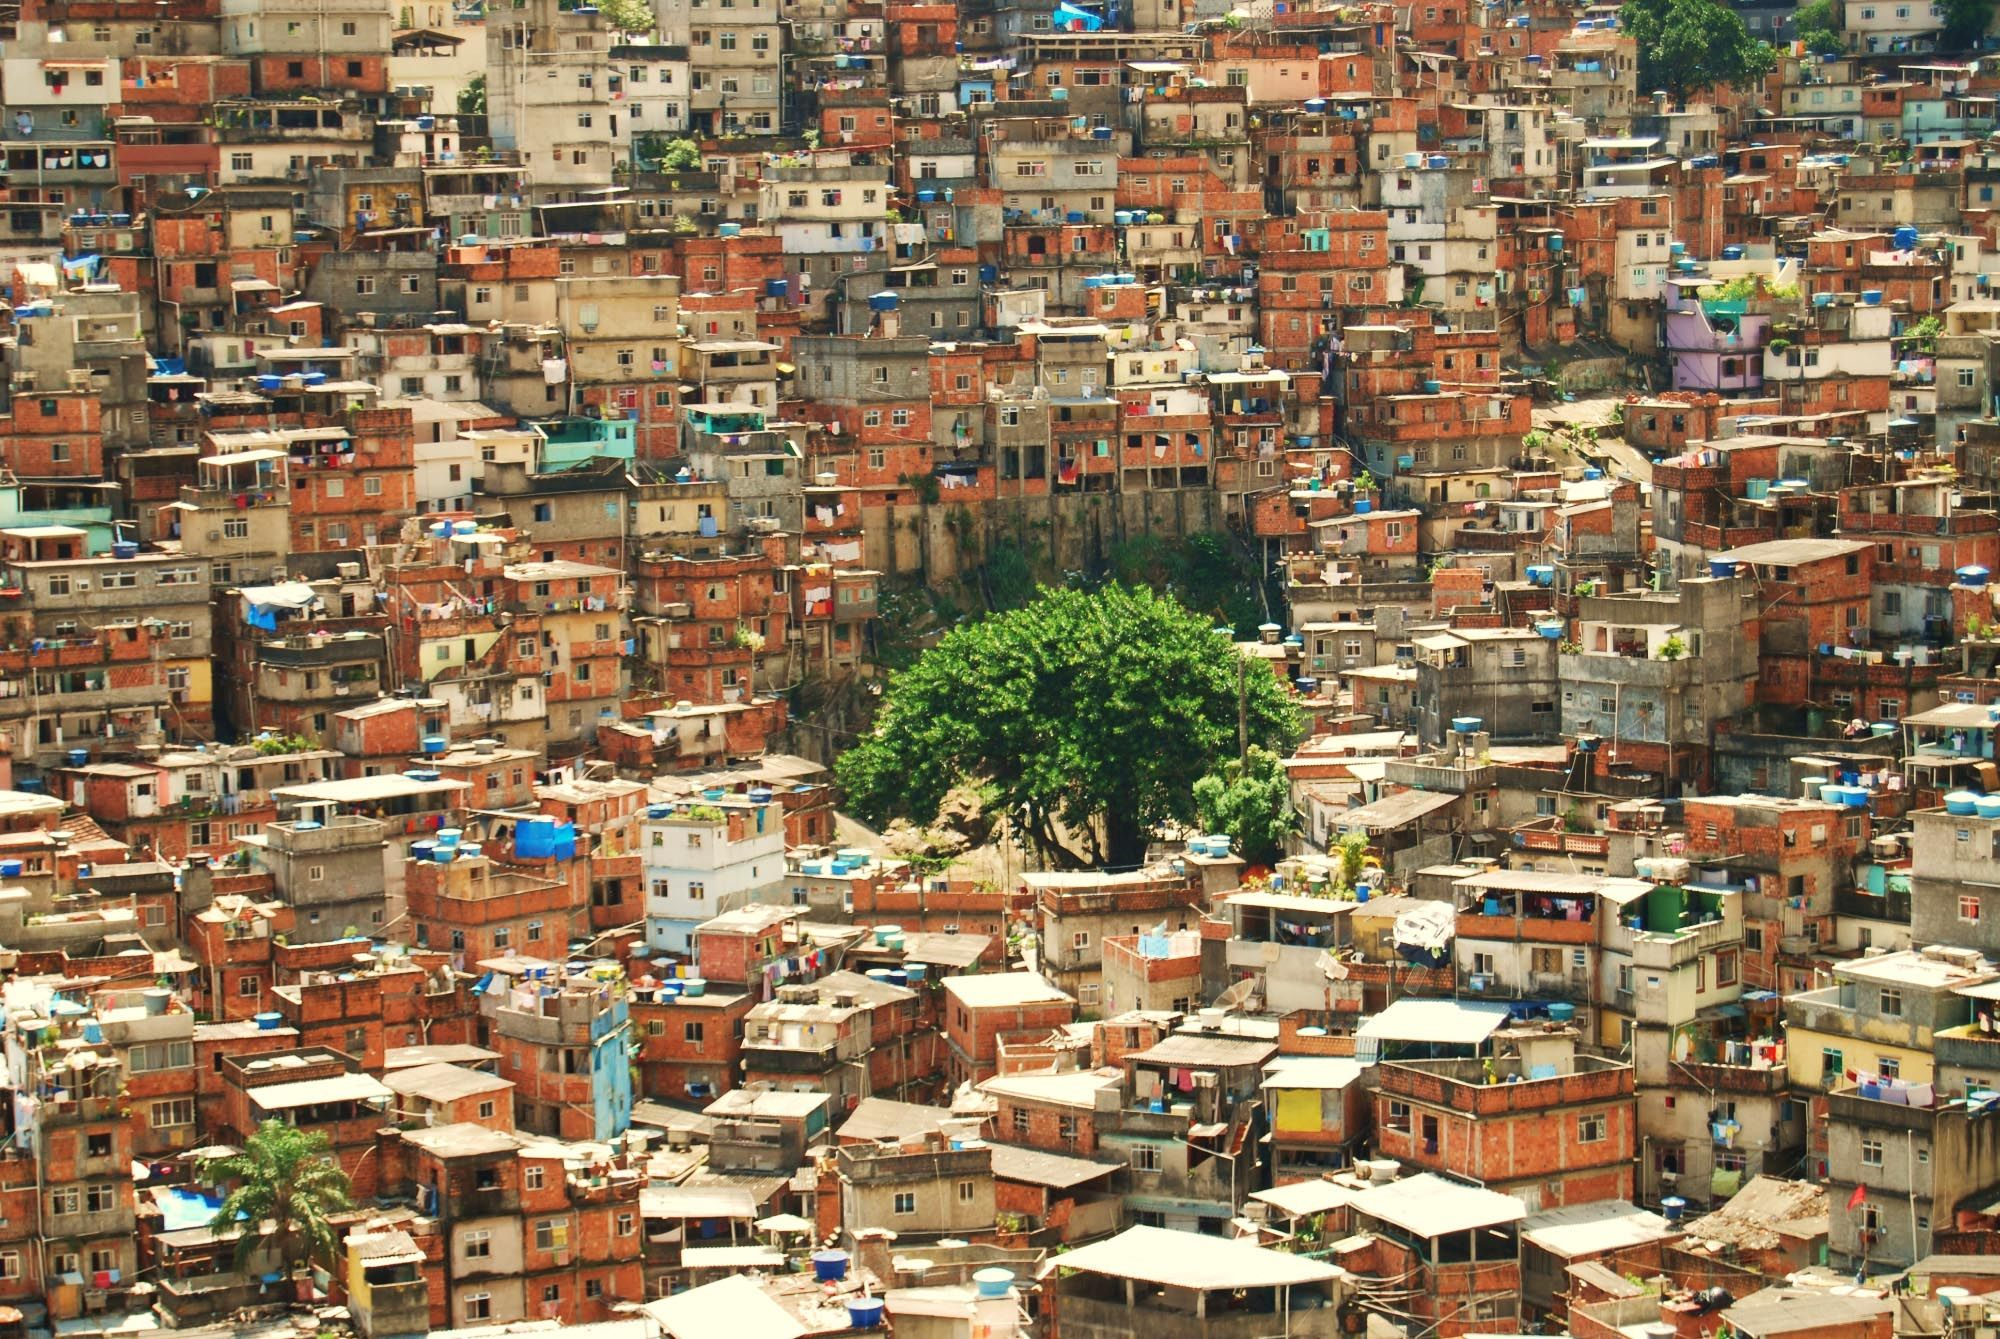 Complexo de Alemao - (2nd Area - 9 Months)